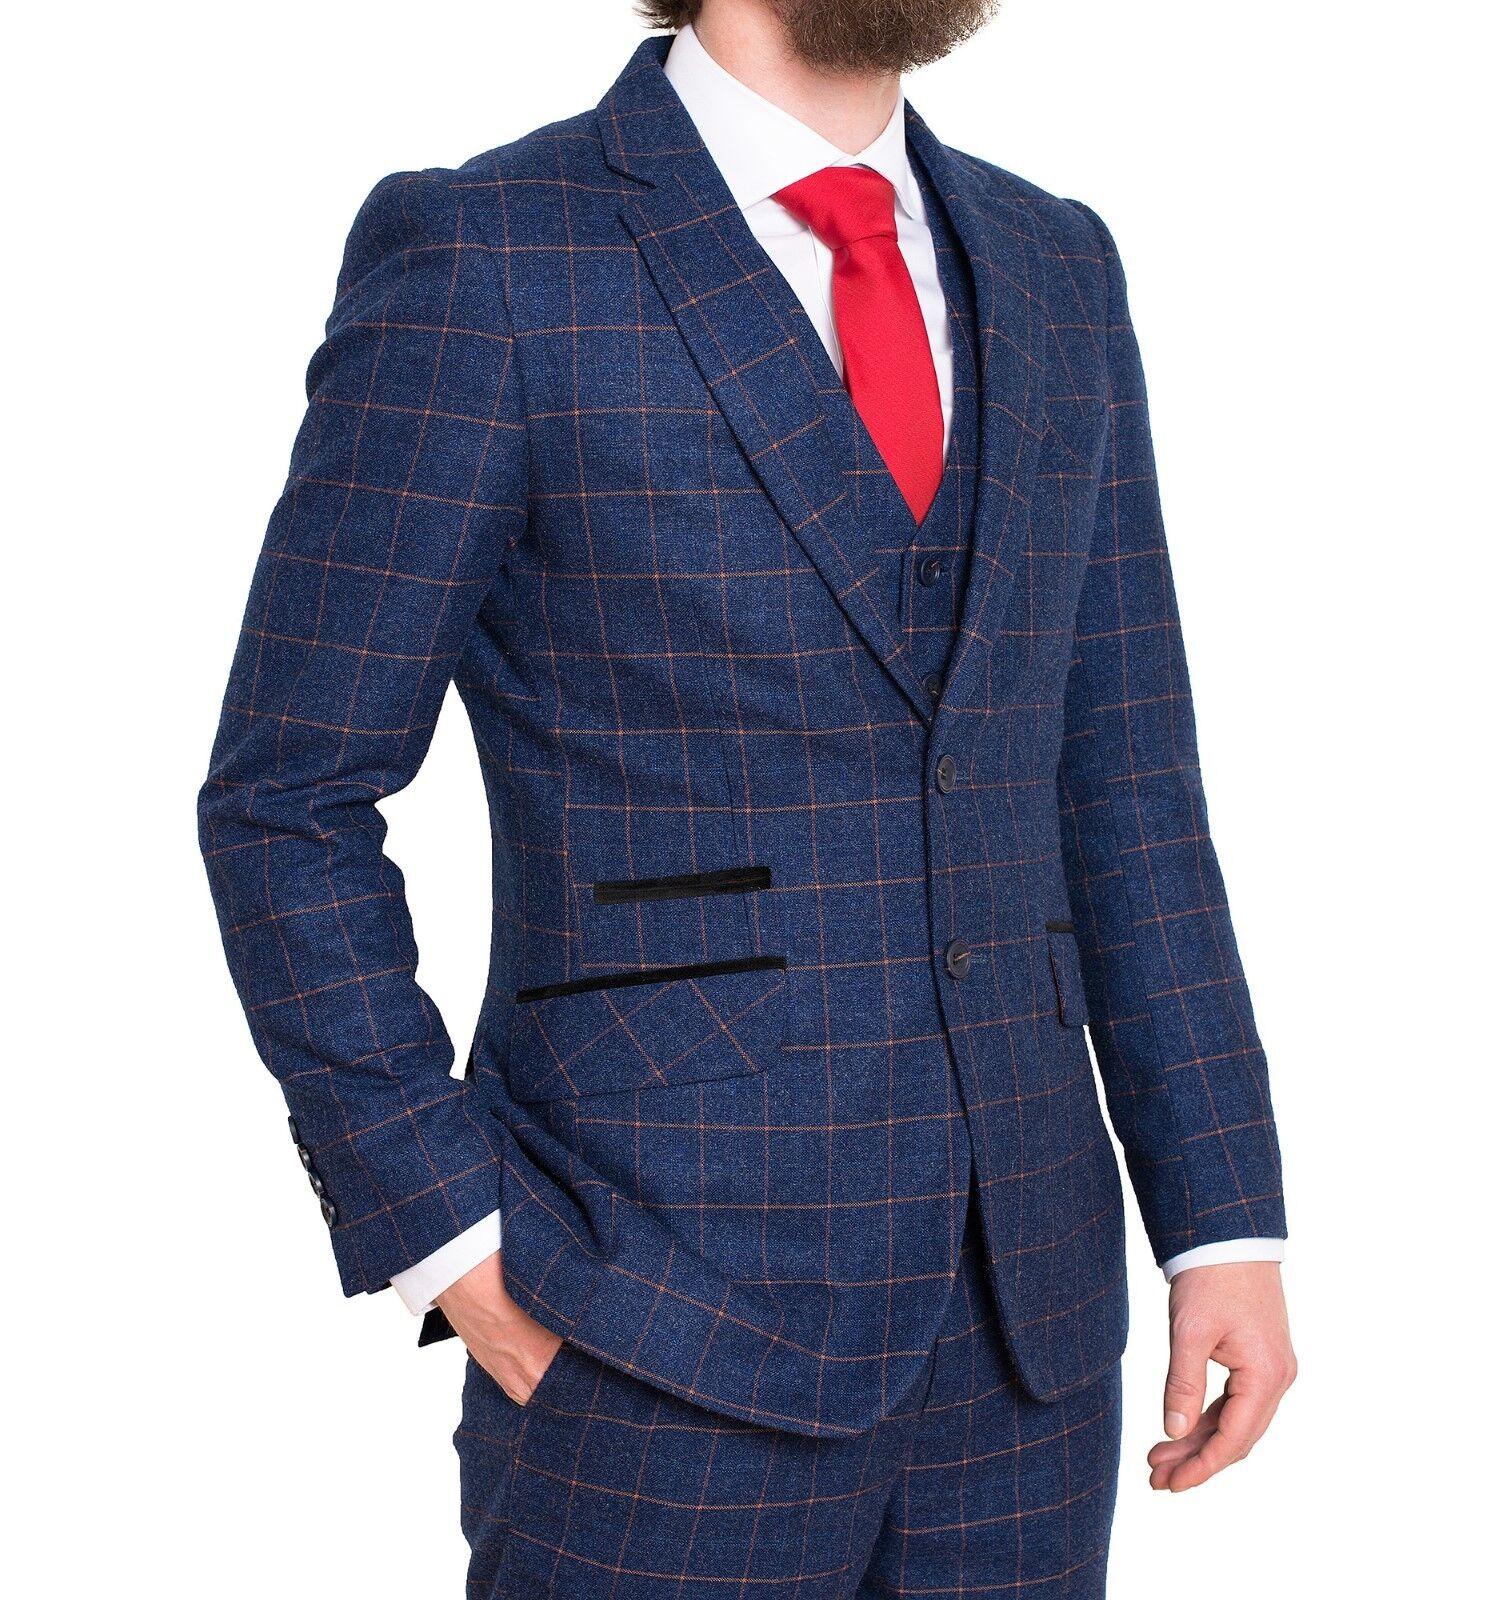 FDQ herren Blau Orange 3 Piece Suit Window Check TailGoldt Fit Retro Smart Vintage